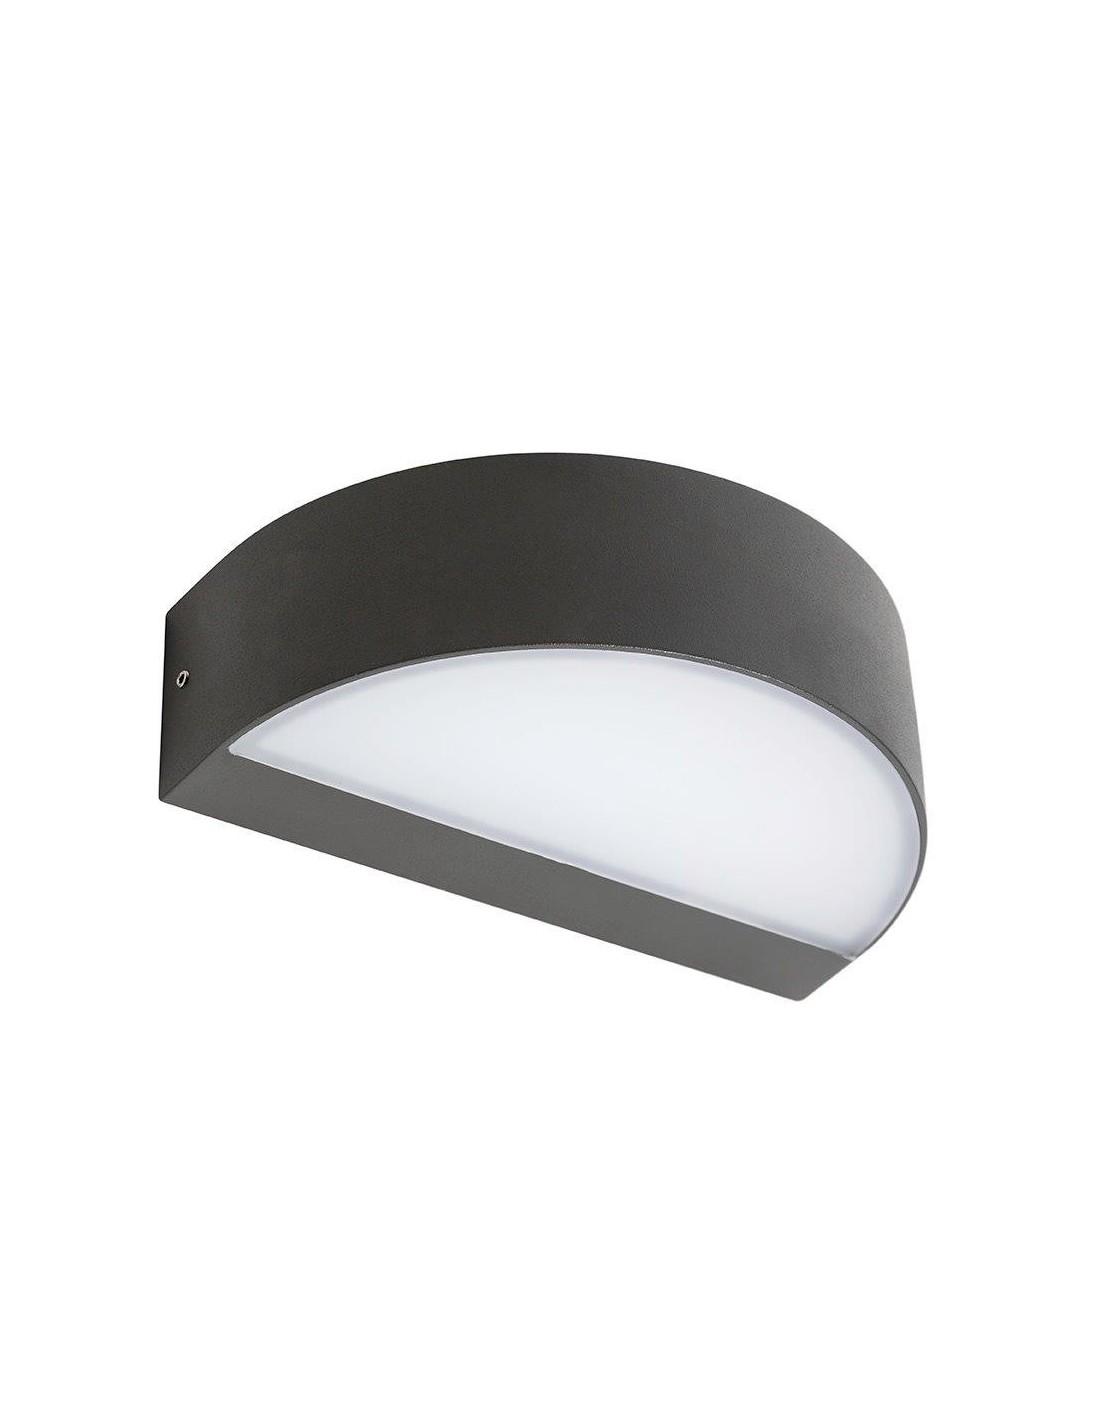 acheter ampoules speciales vintage 71422401. Black Bedroom Furniture Sets. Home Design Ideas